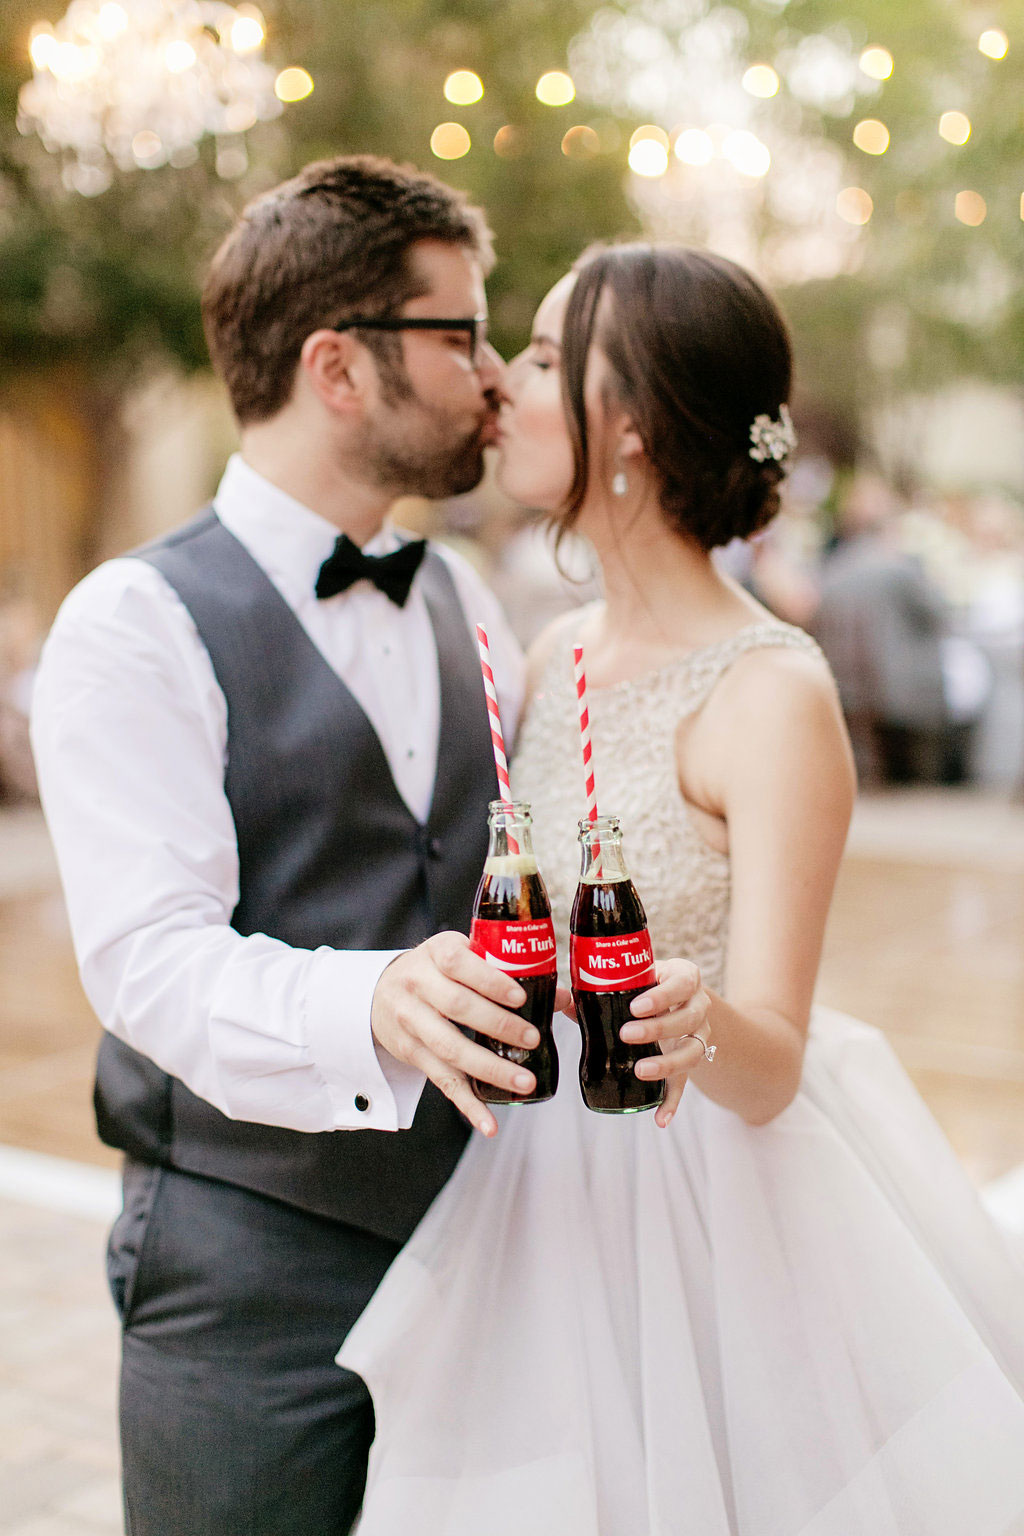 Samantha + Kent // Serra Plaza Wedding // Chard Photography // Lucky Day Events Co.